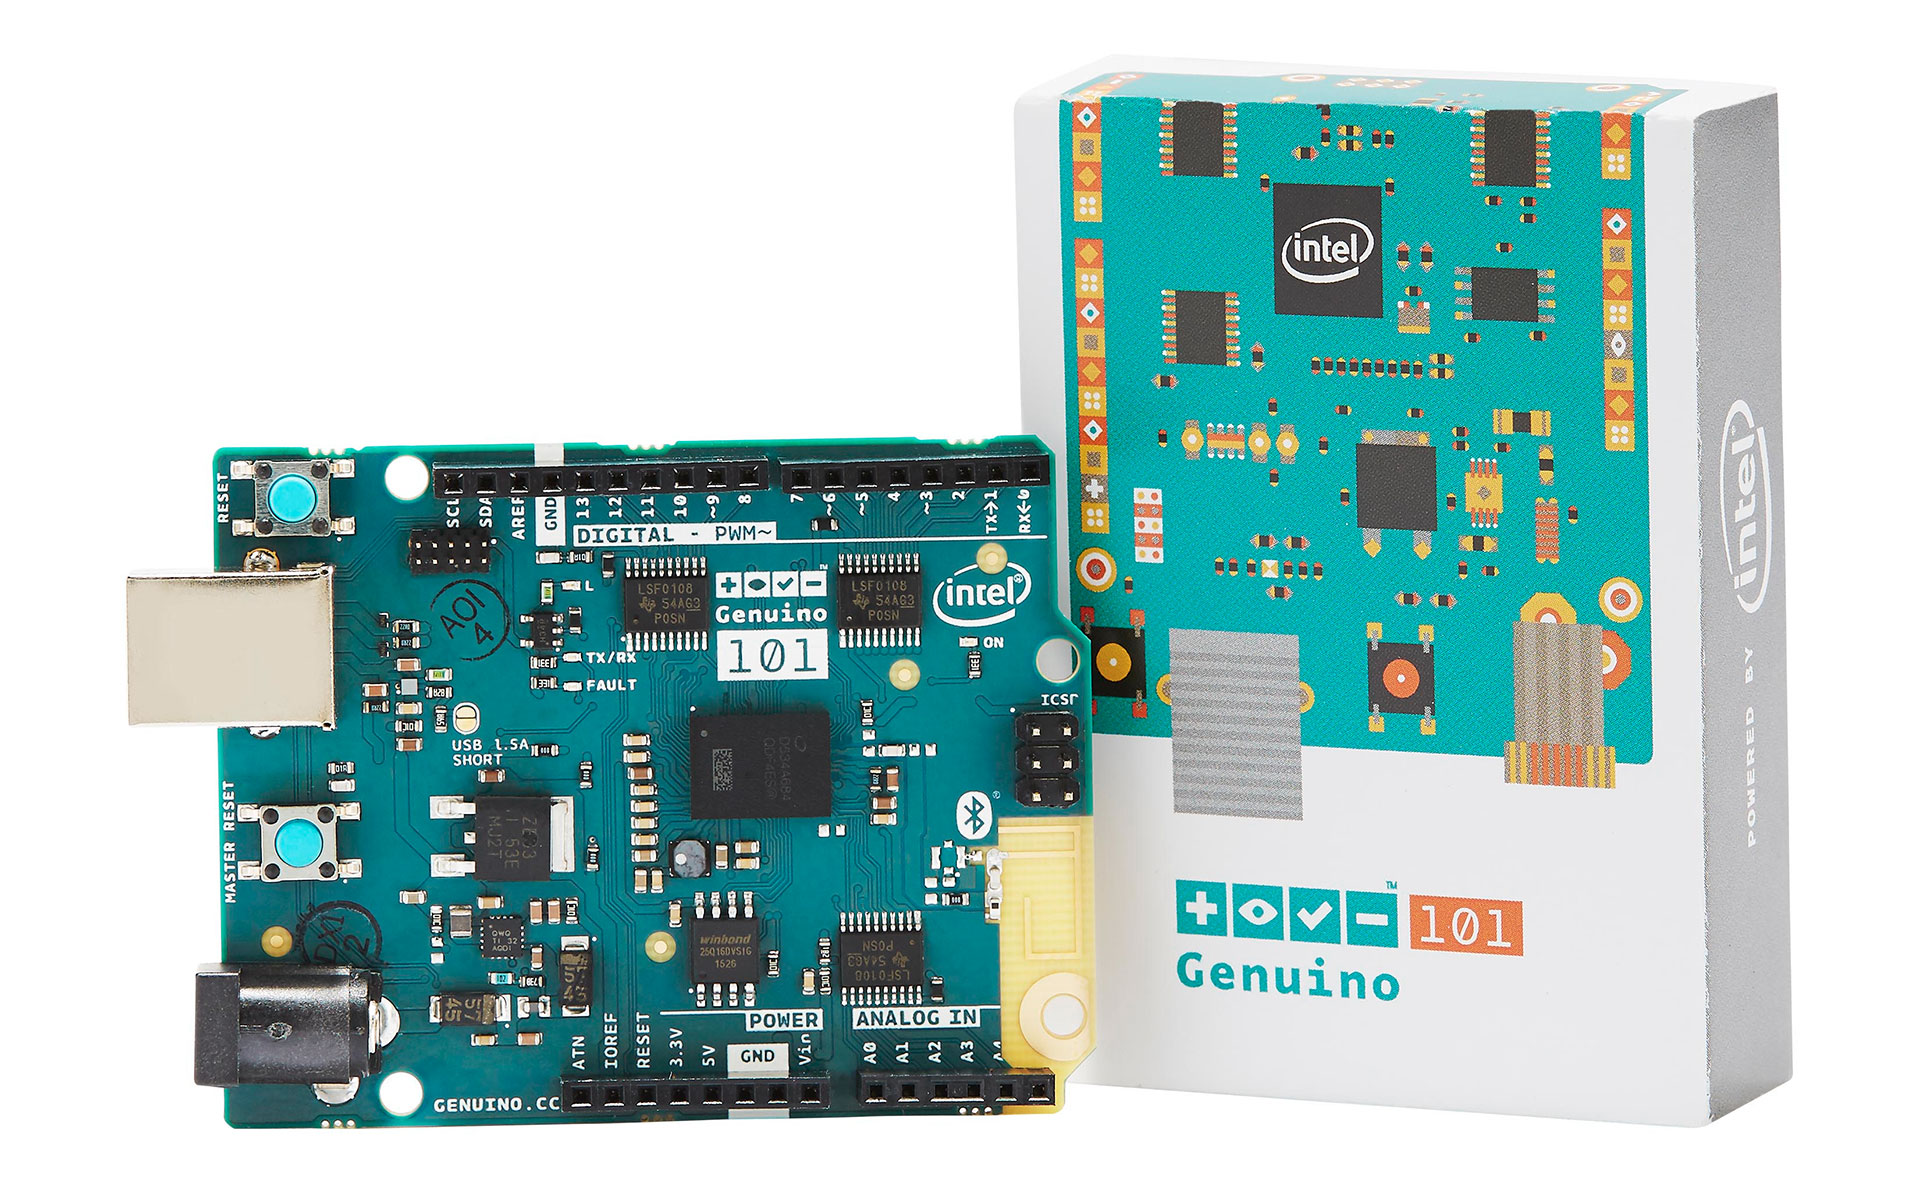 Intel Genuino 101